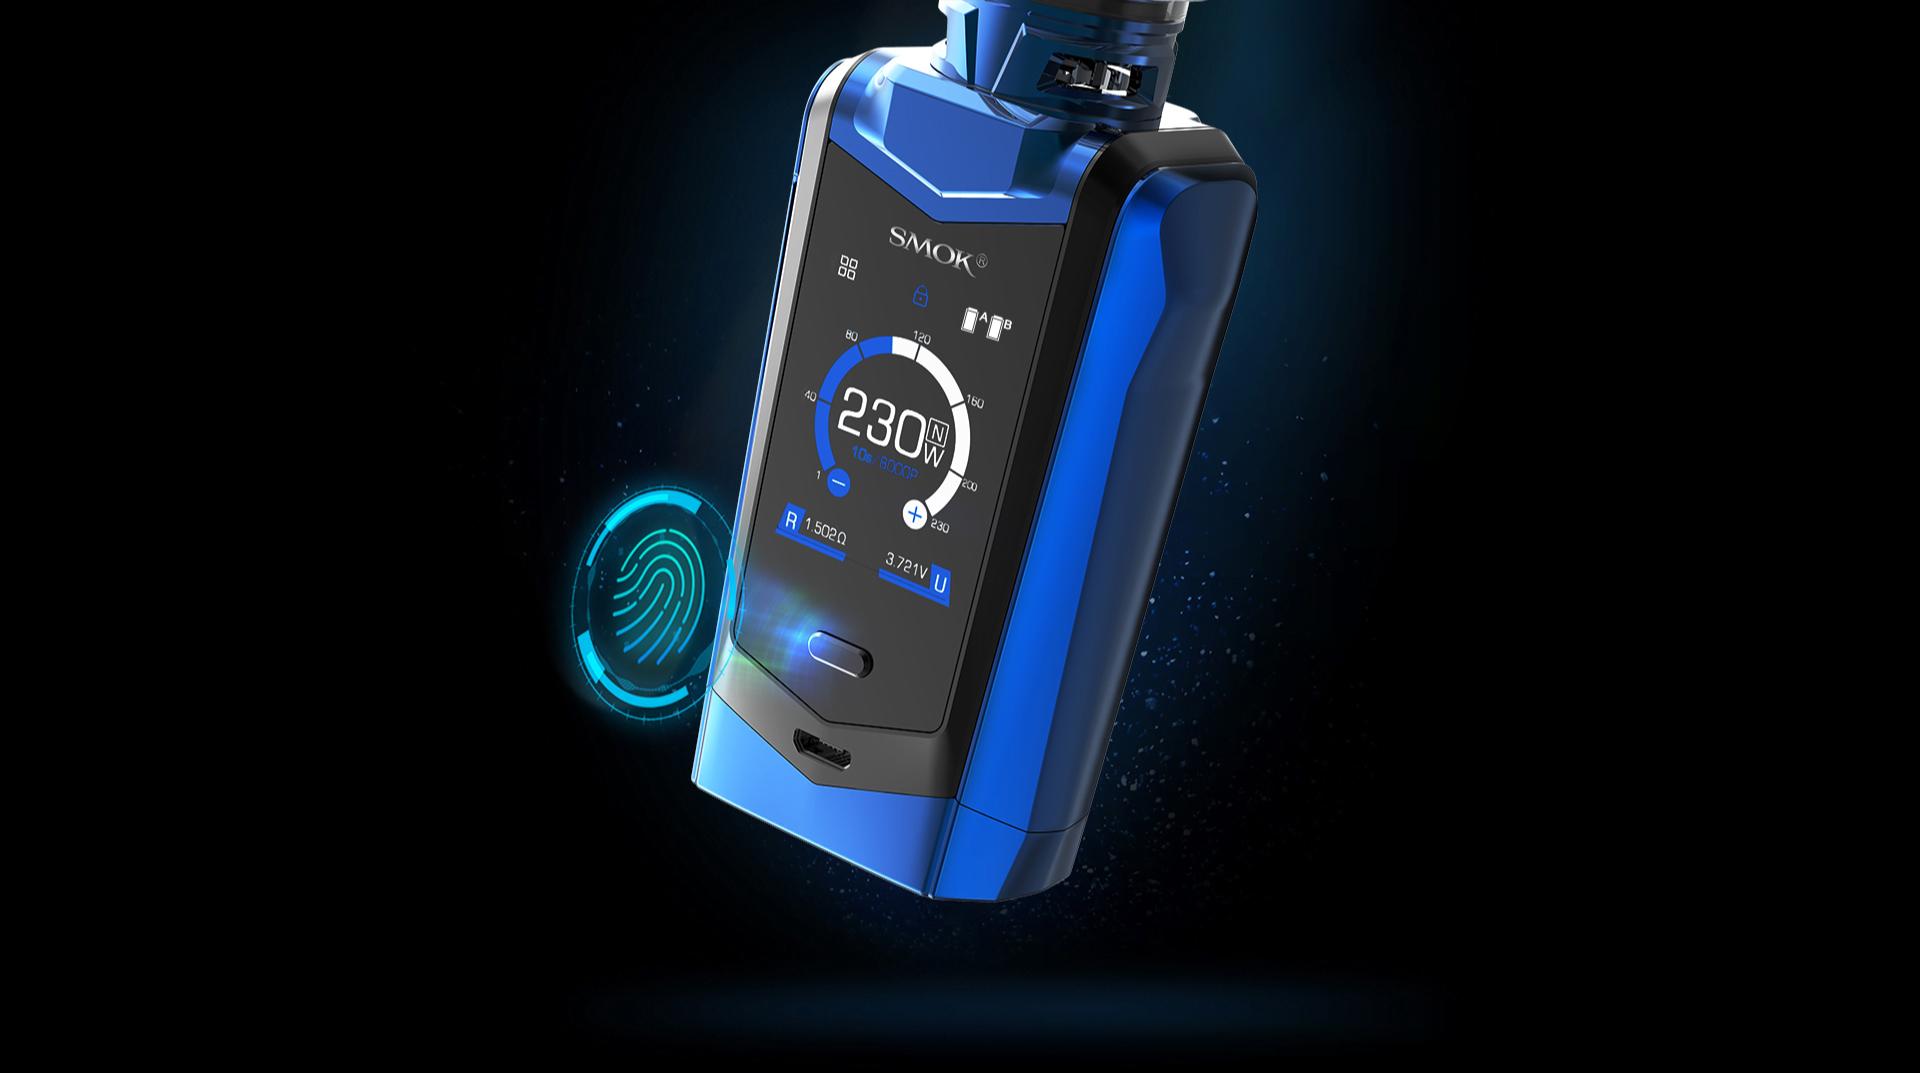 SMOK SPECIES 230W Kit - Vape Kits | SMOK® Official